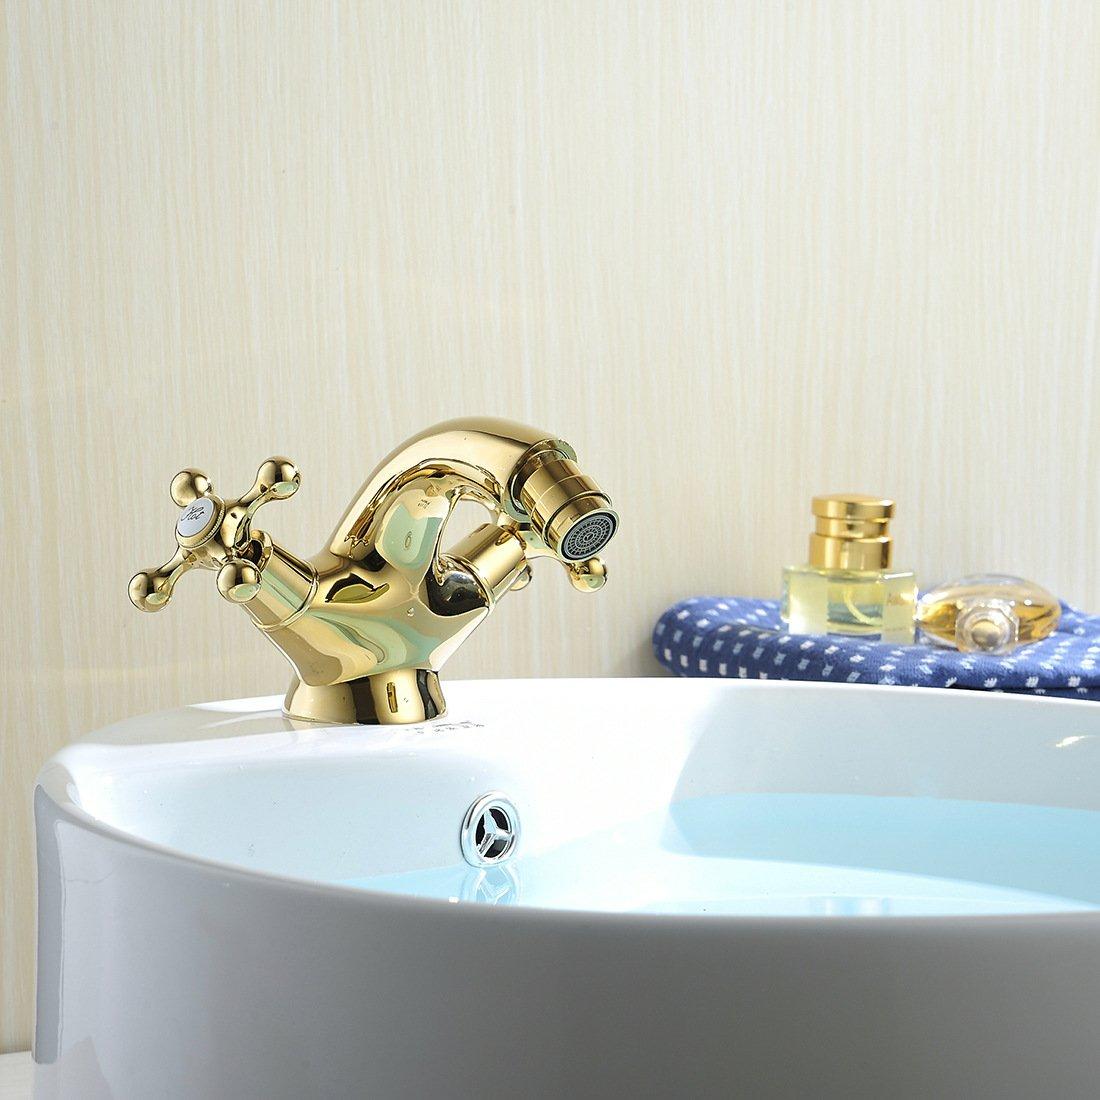 Hlluya Grifo Cocina Lavabo de de de Baño Grifos Lavabo del baño baño de Oro Tap-Tap de Agua. c02d78